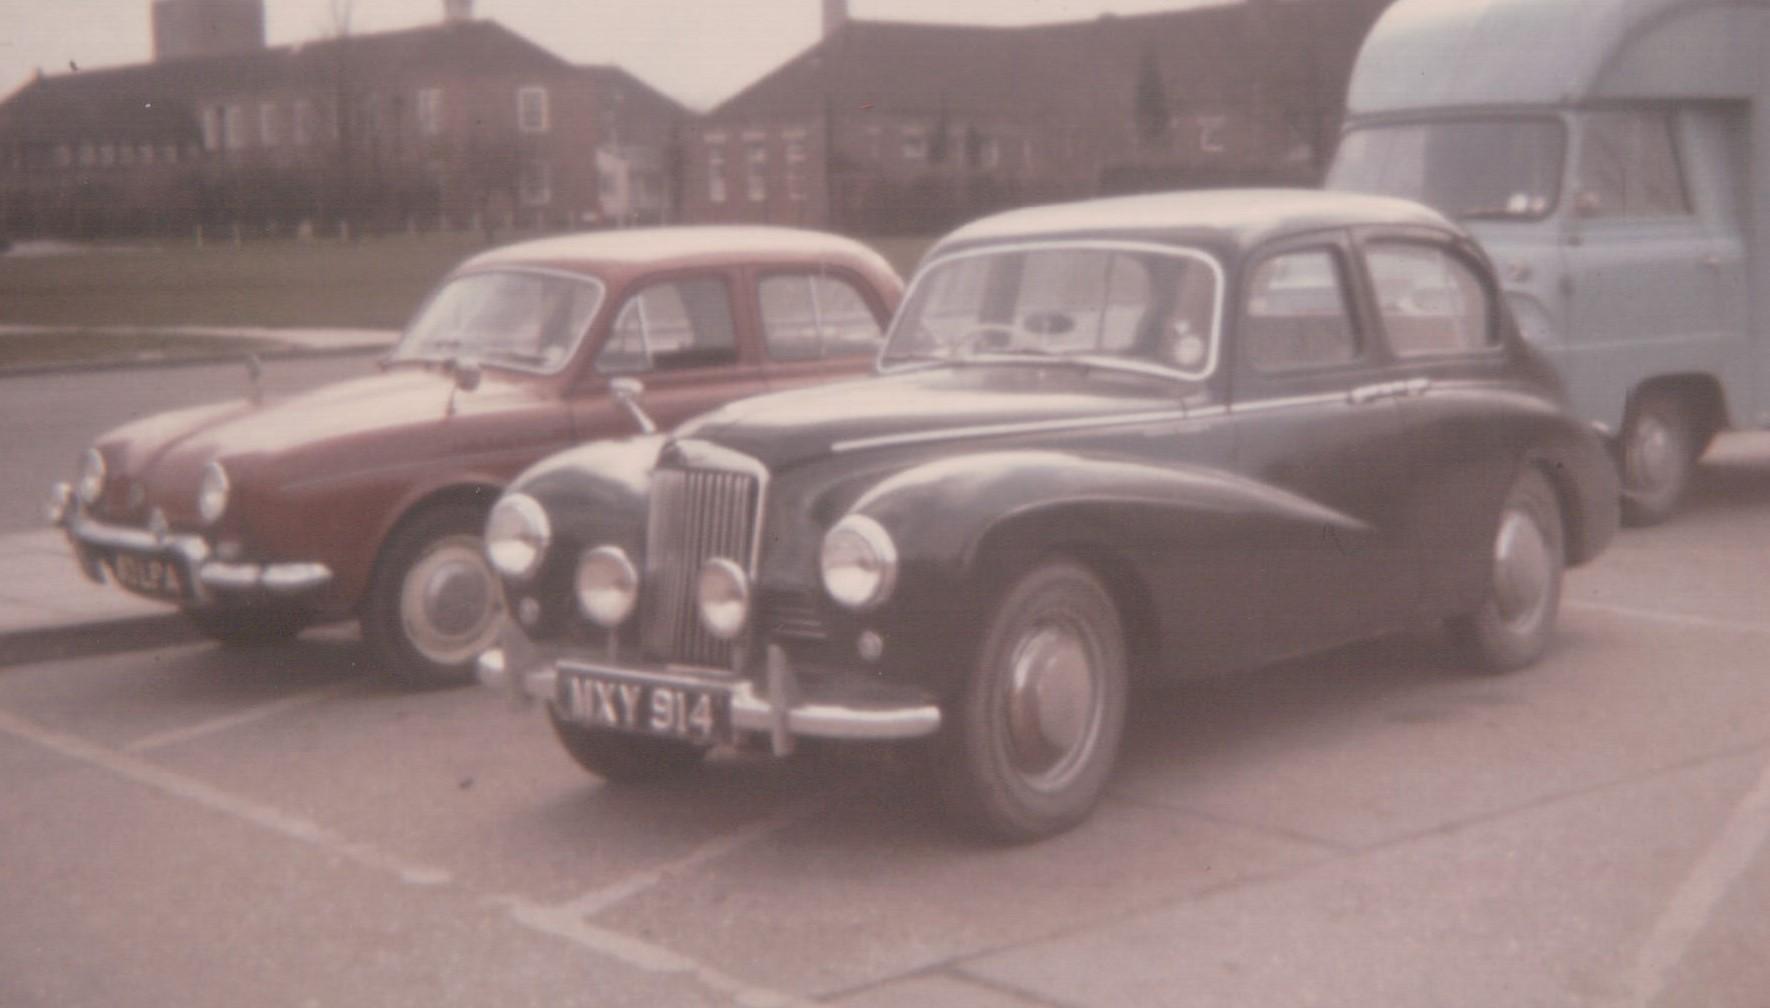 1952 Sunbeam Talbot 90 Mk IIa at Harwell 1965